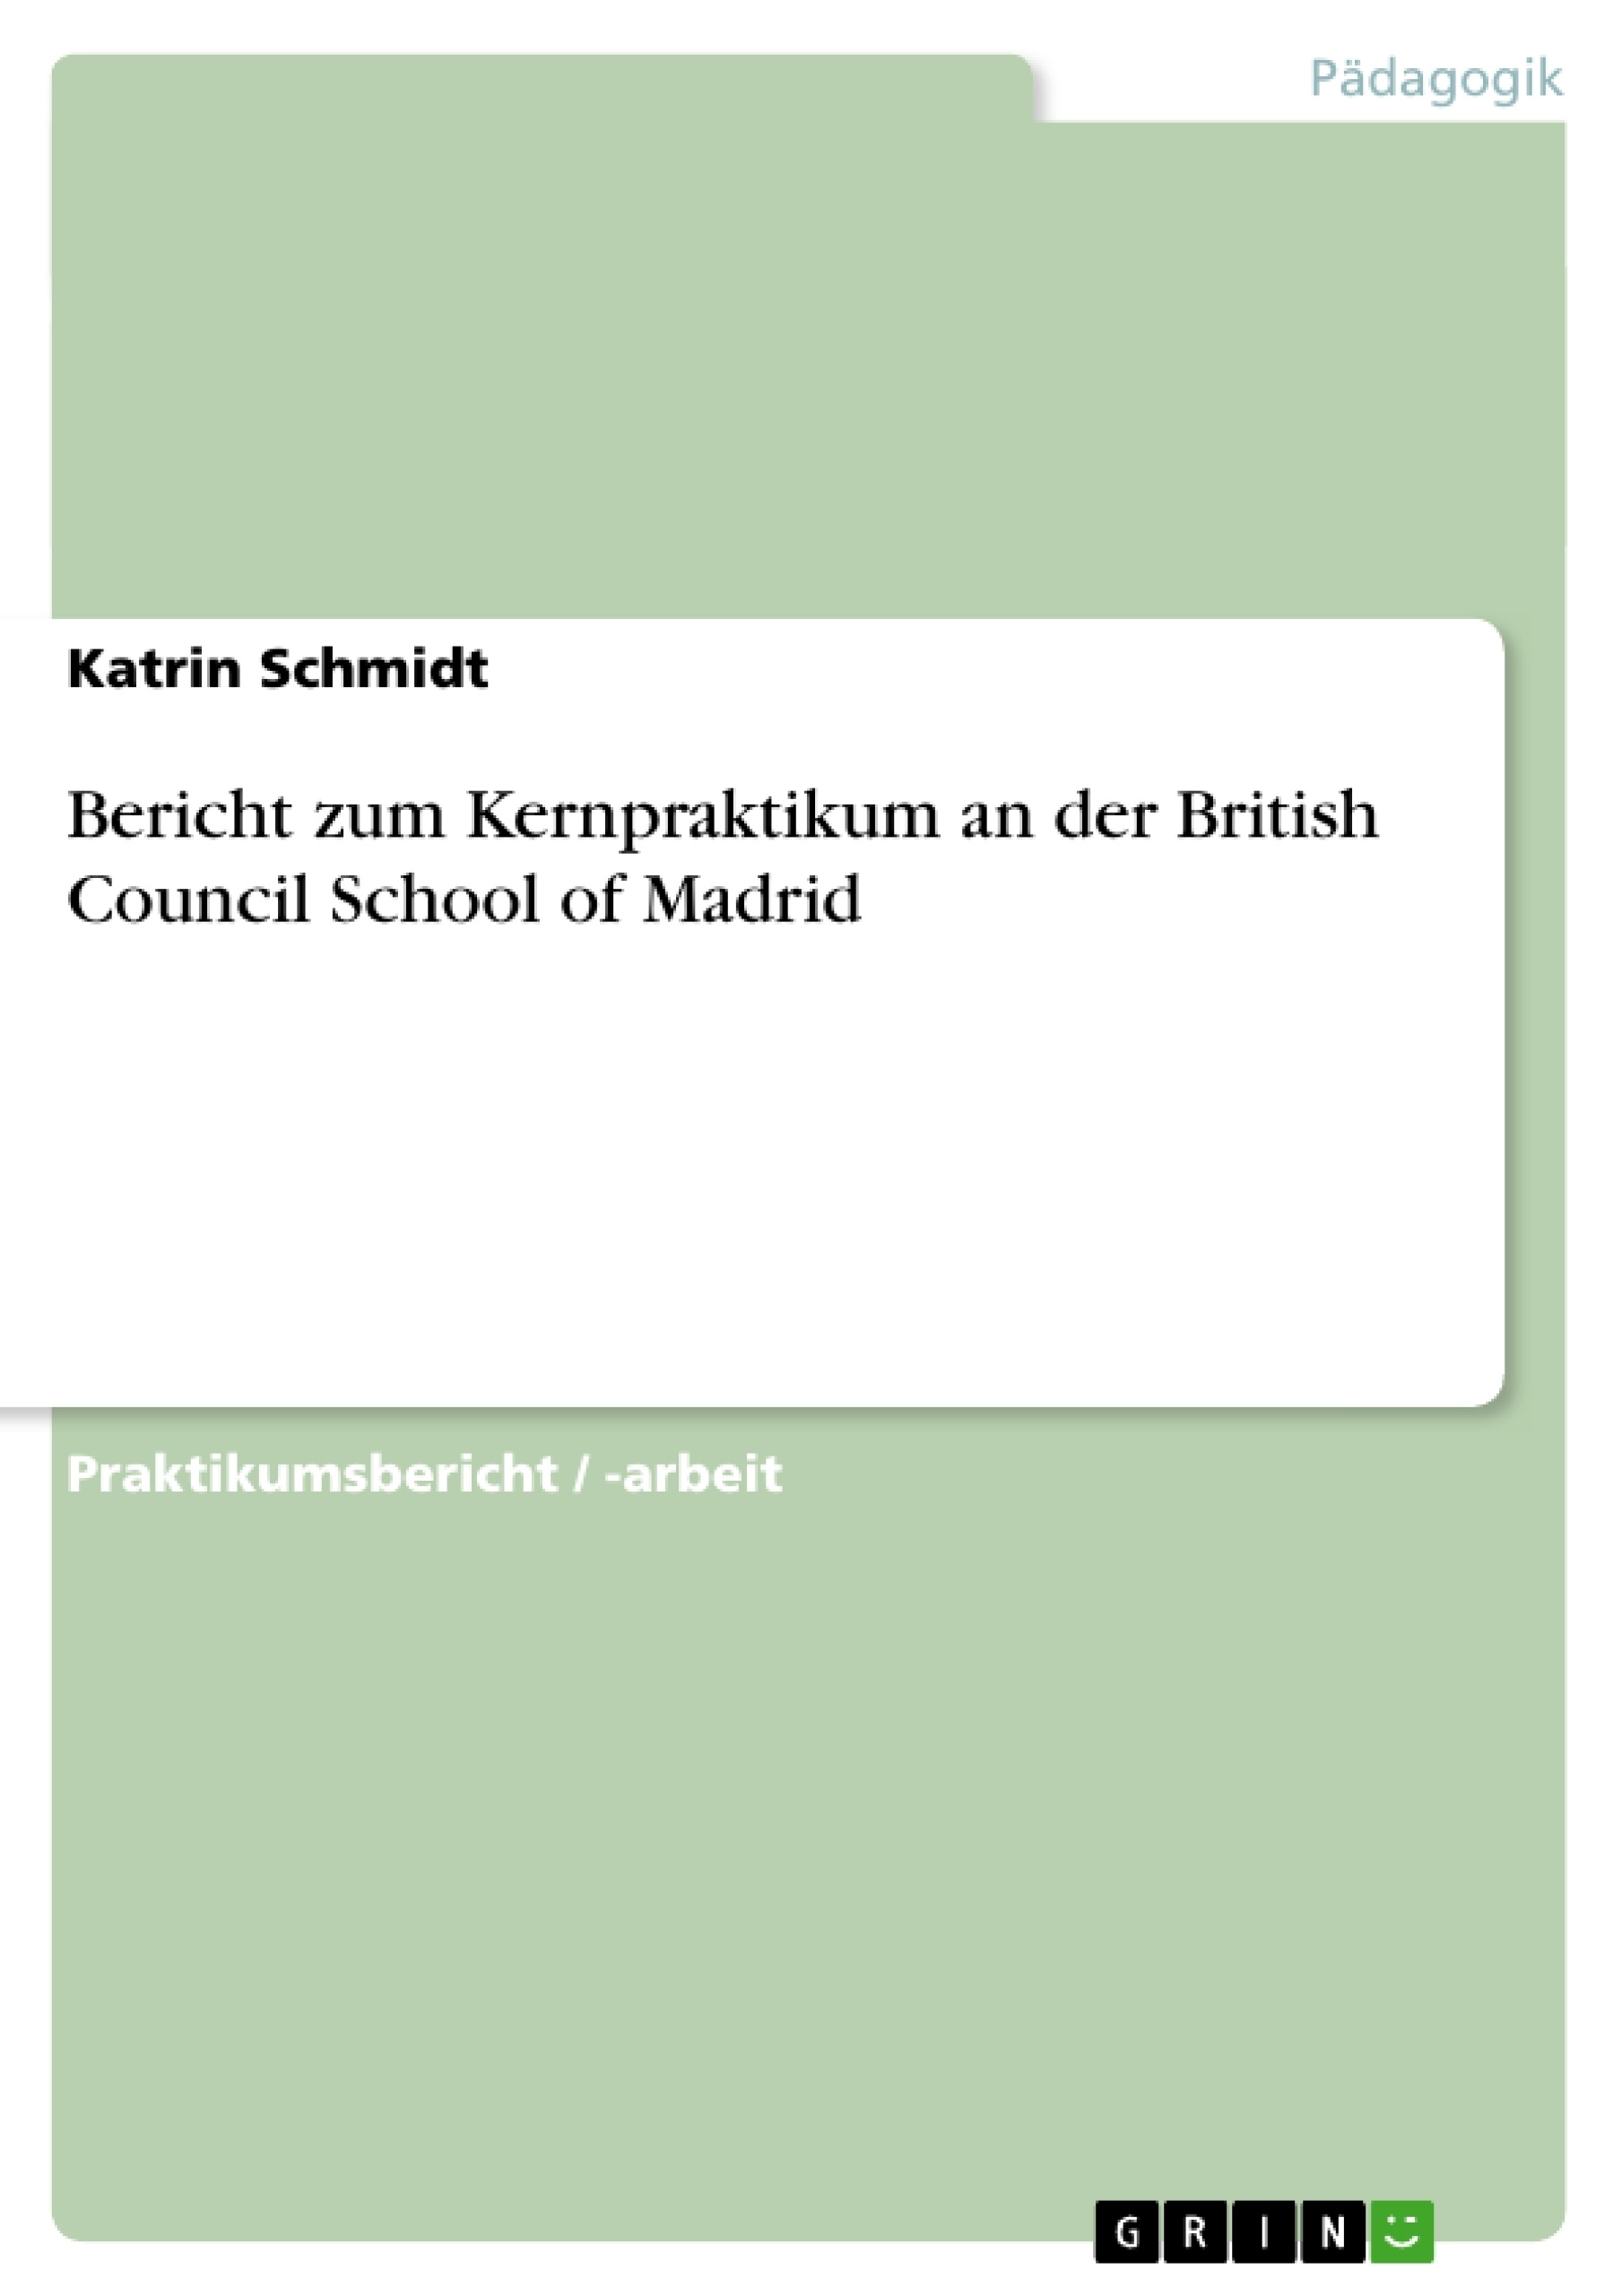 Titel: Bericht zum Kernpraktikum an der British Council School of Madrid